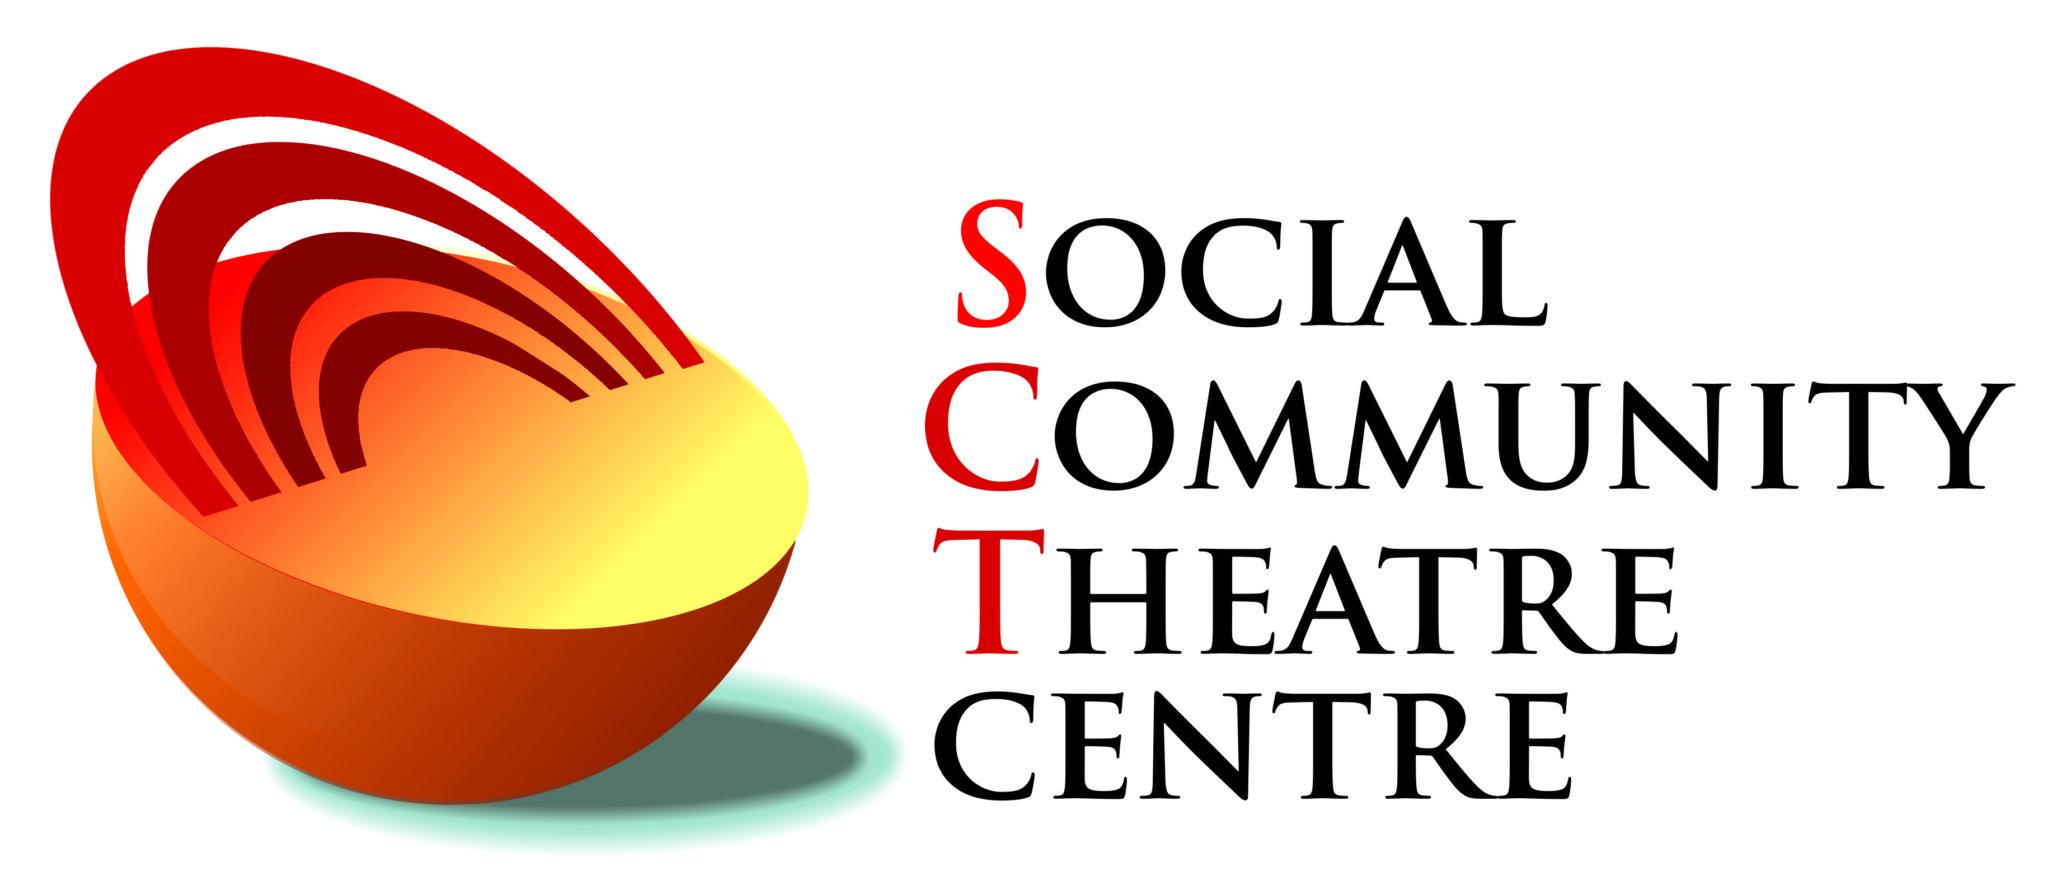 Social Community Theatre Centre